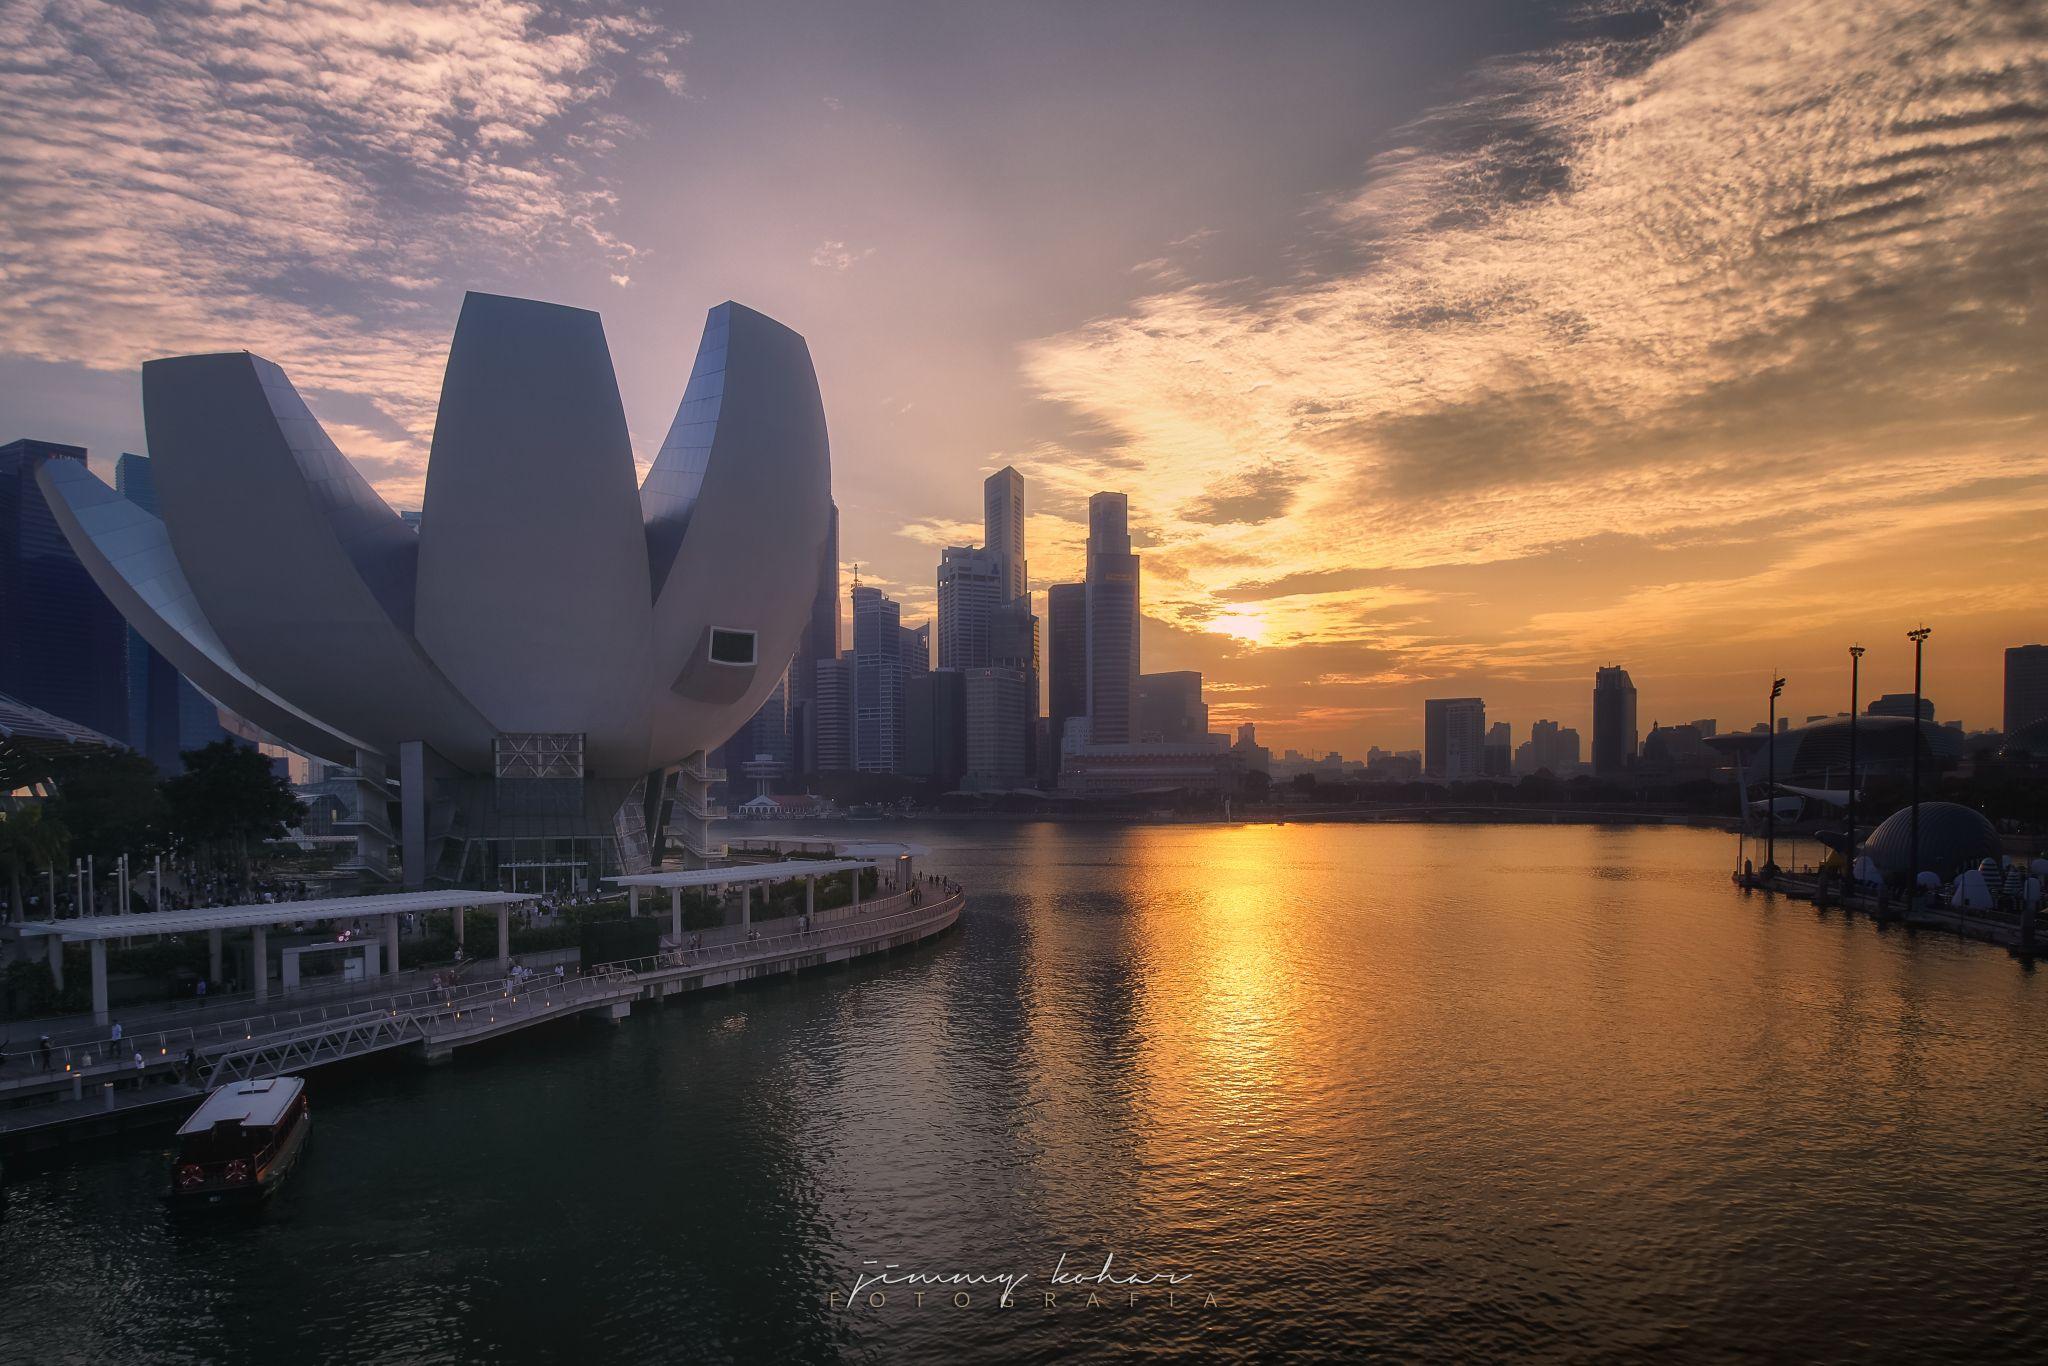 Sunset from the Helix Bridge, Singapore